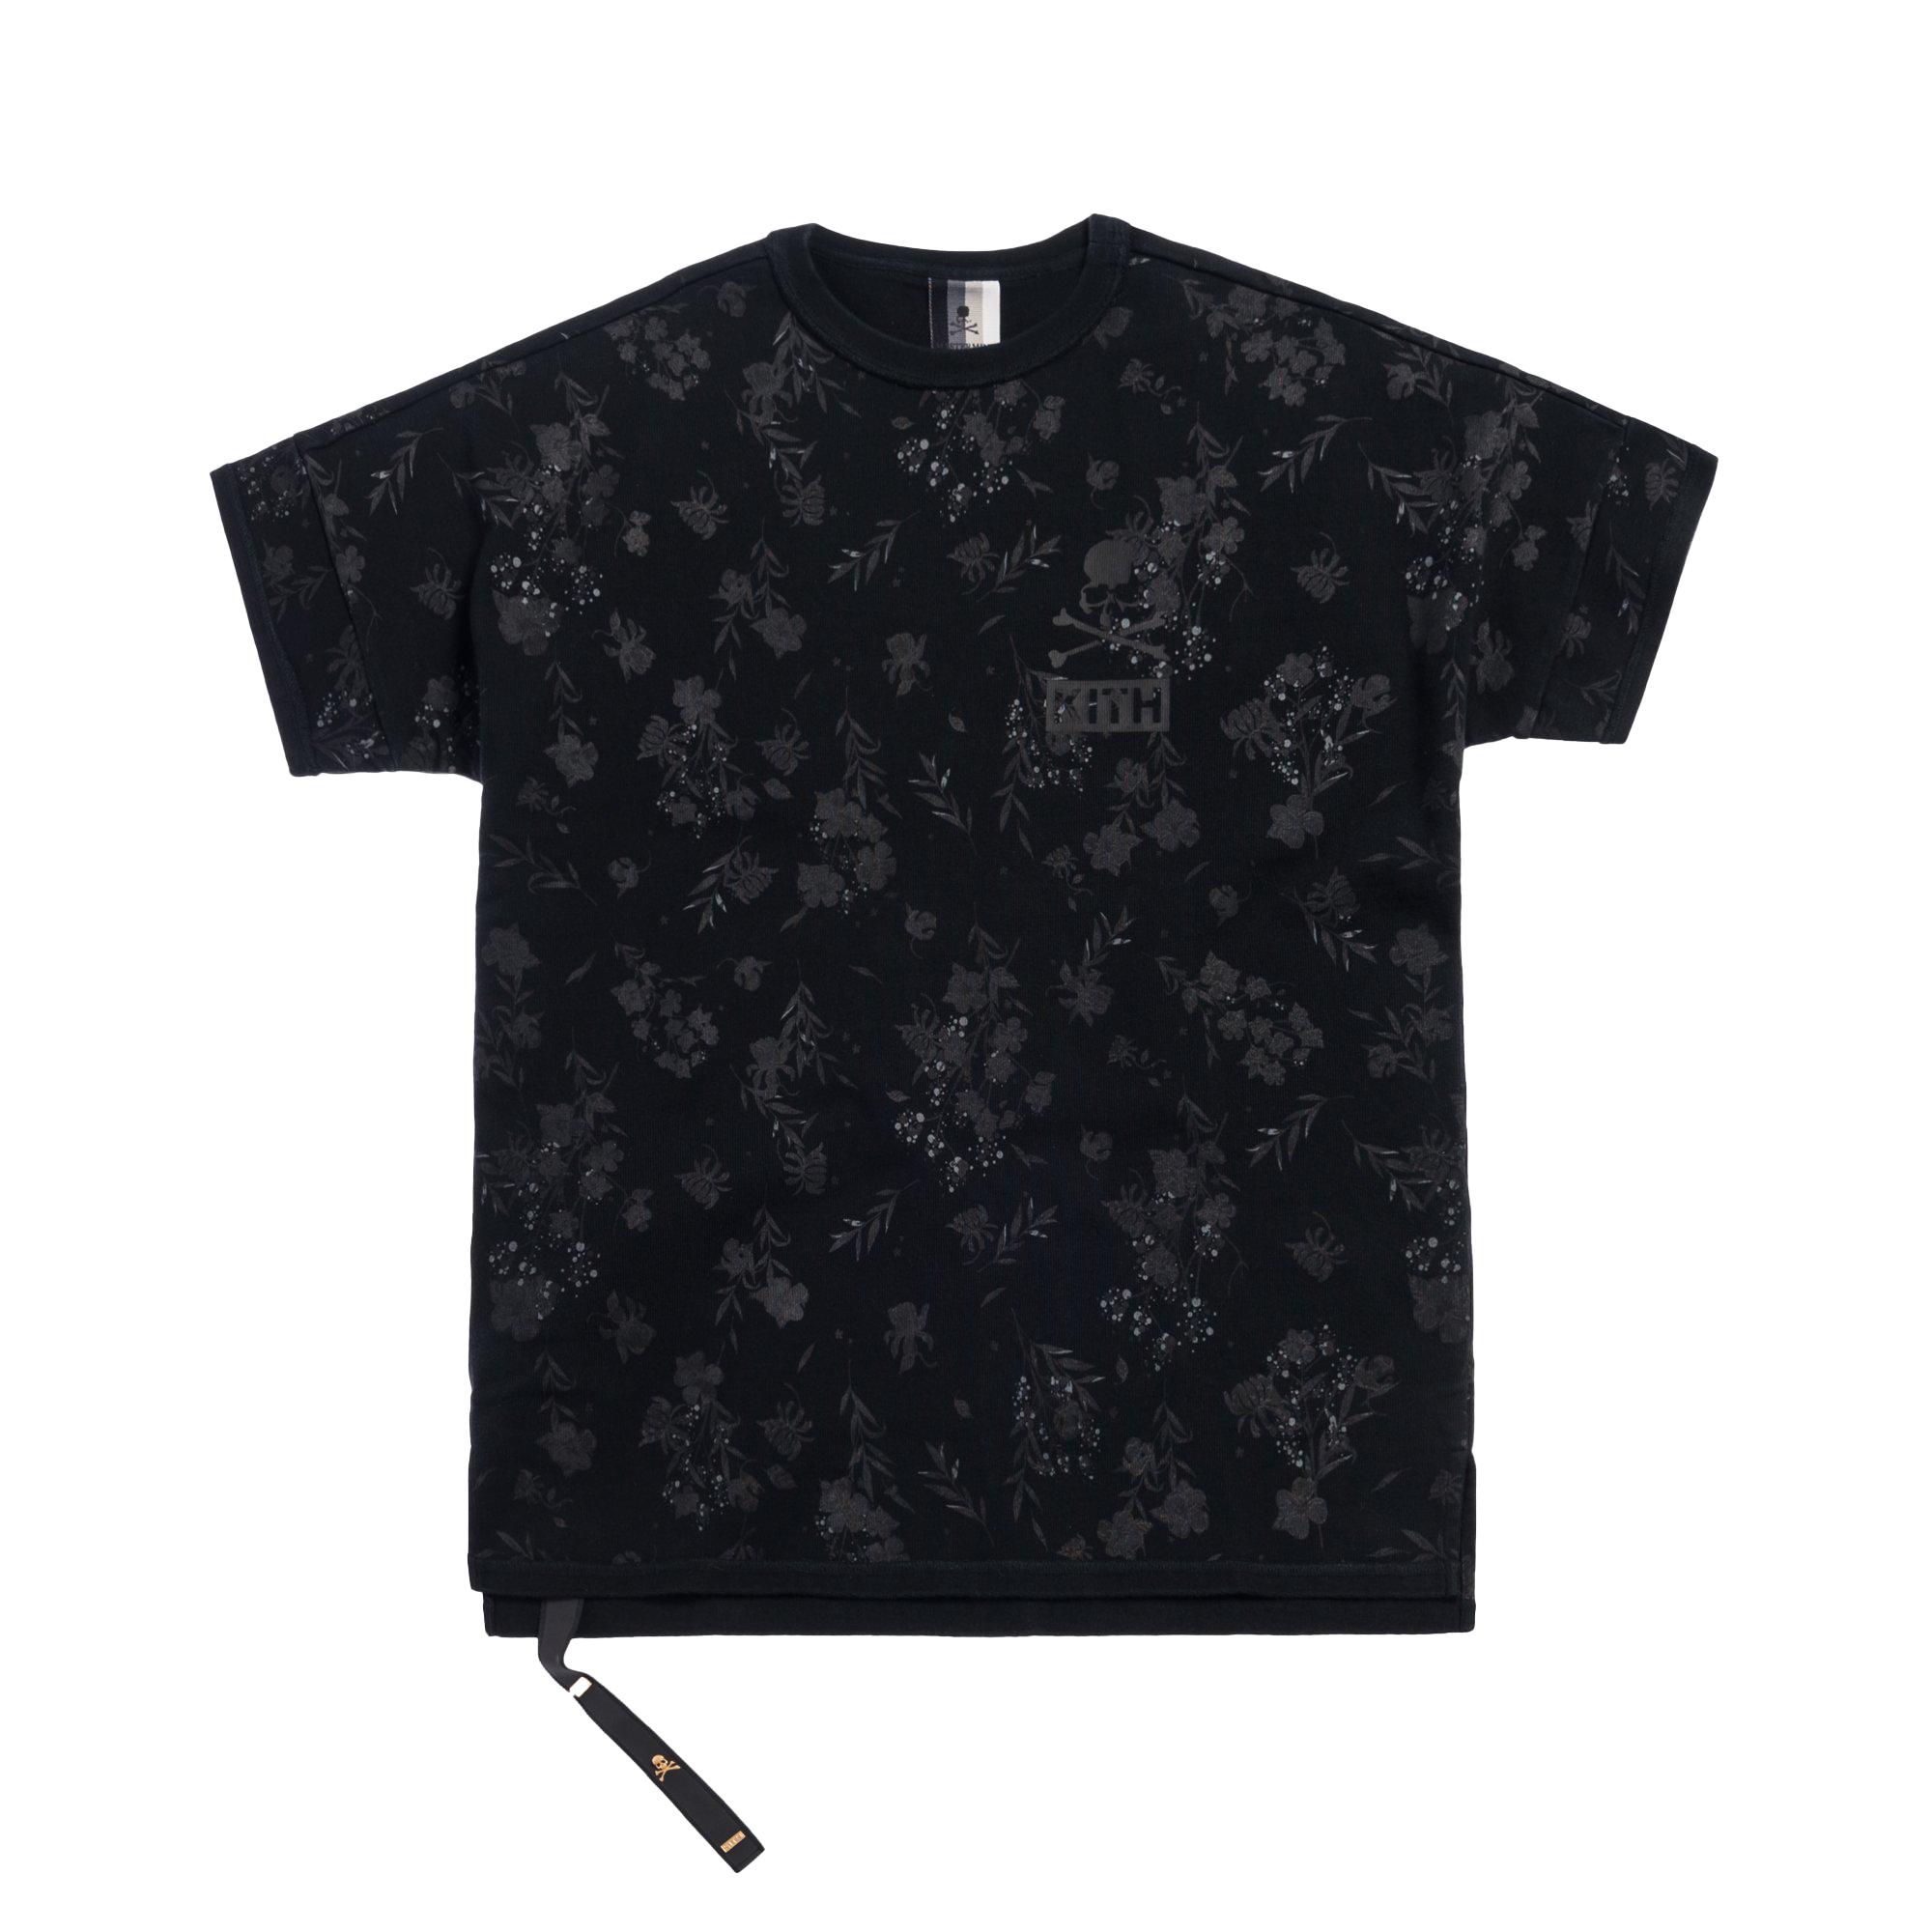 Kith x mastermind WORLD Reverse Floral Tee Black